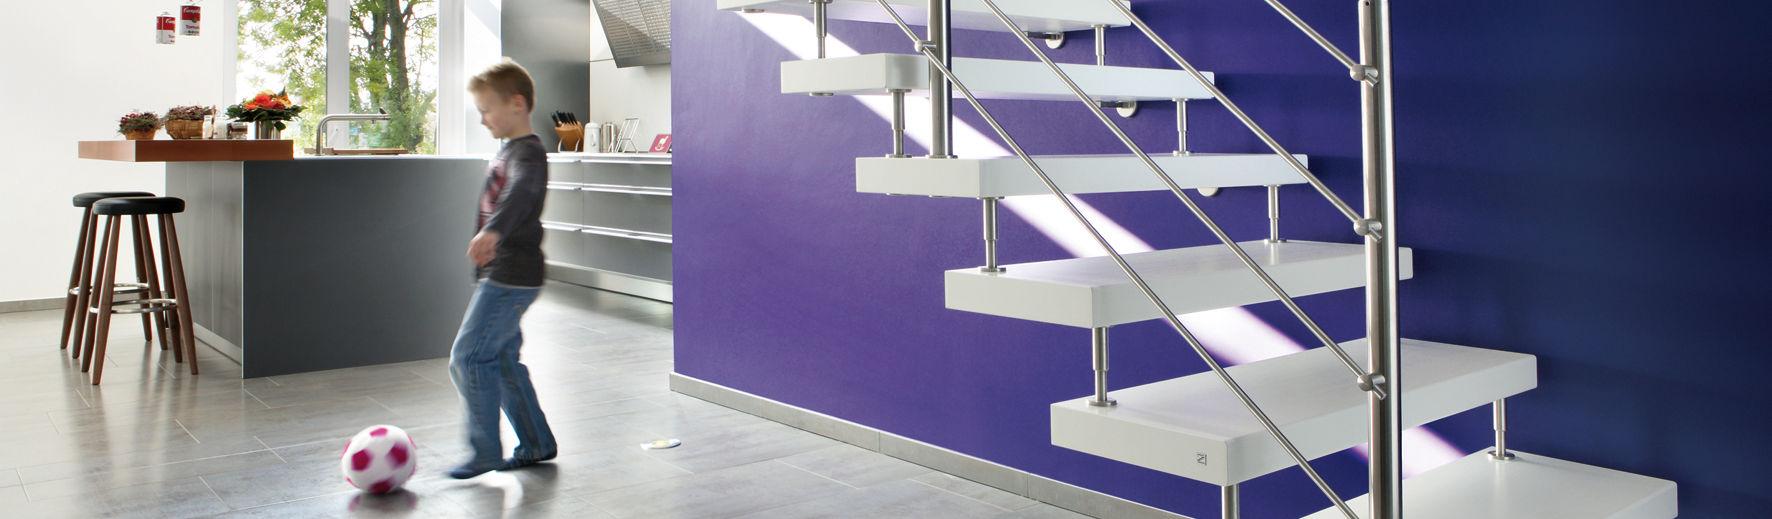 kenngott treppen longlife holz metall stein treppen und. Black Bedroom Furniture Sets. Home Design Ideas